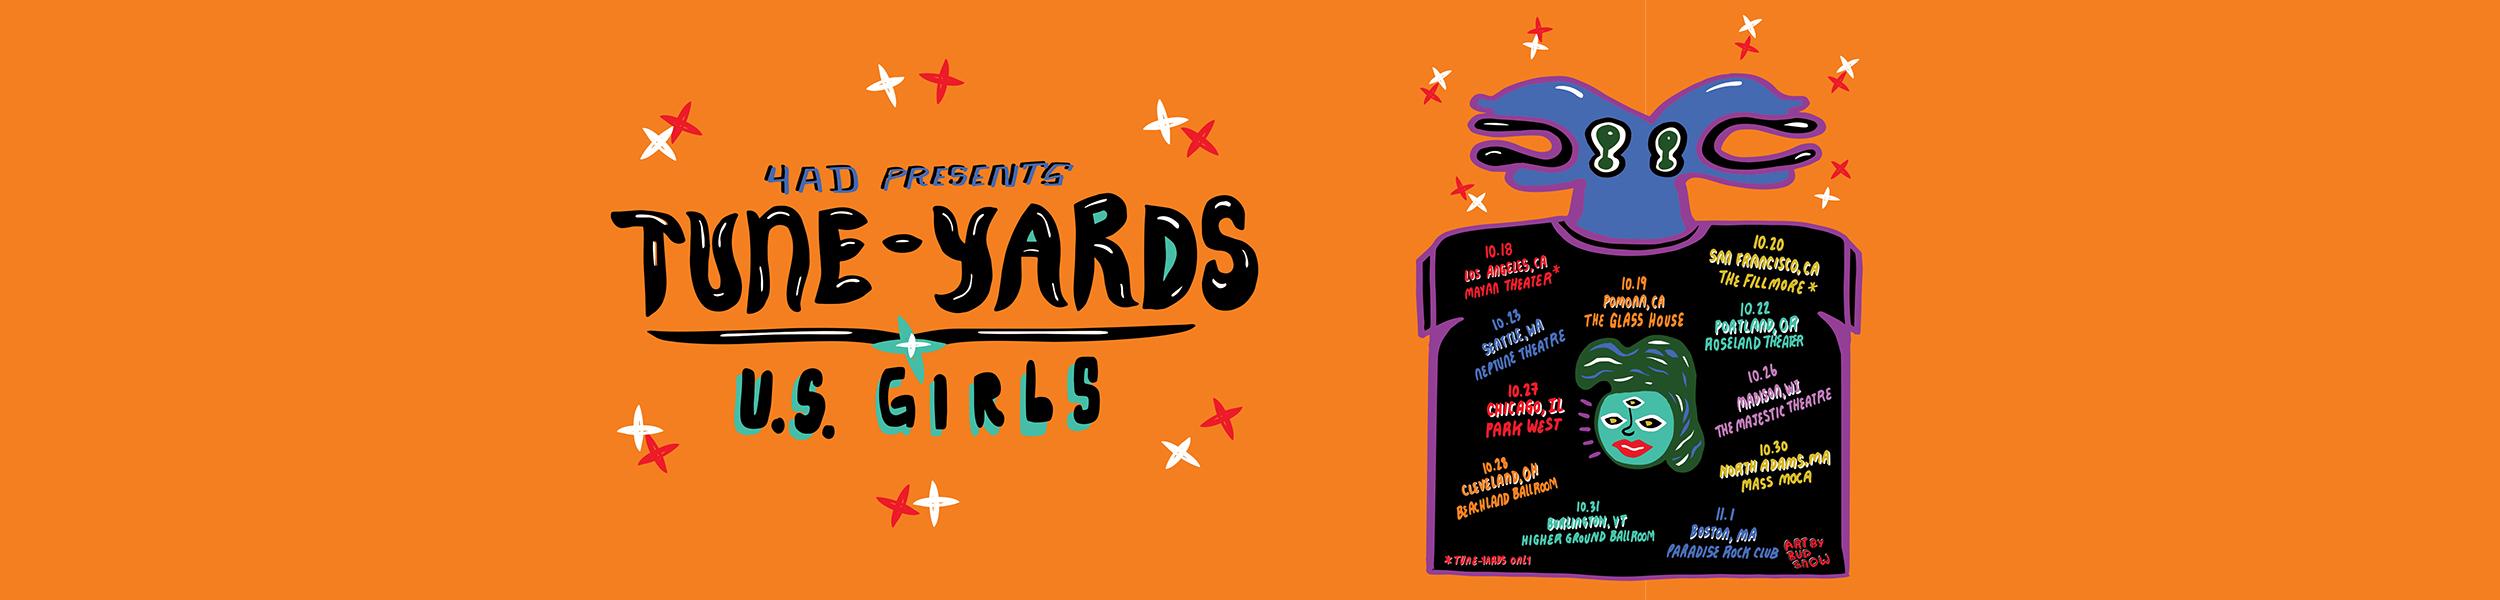 Tune-Yards - 4AD Presents Tune-Yards & U.S. Girls Tour